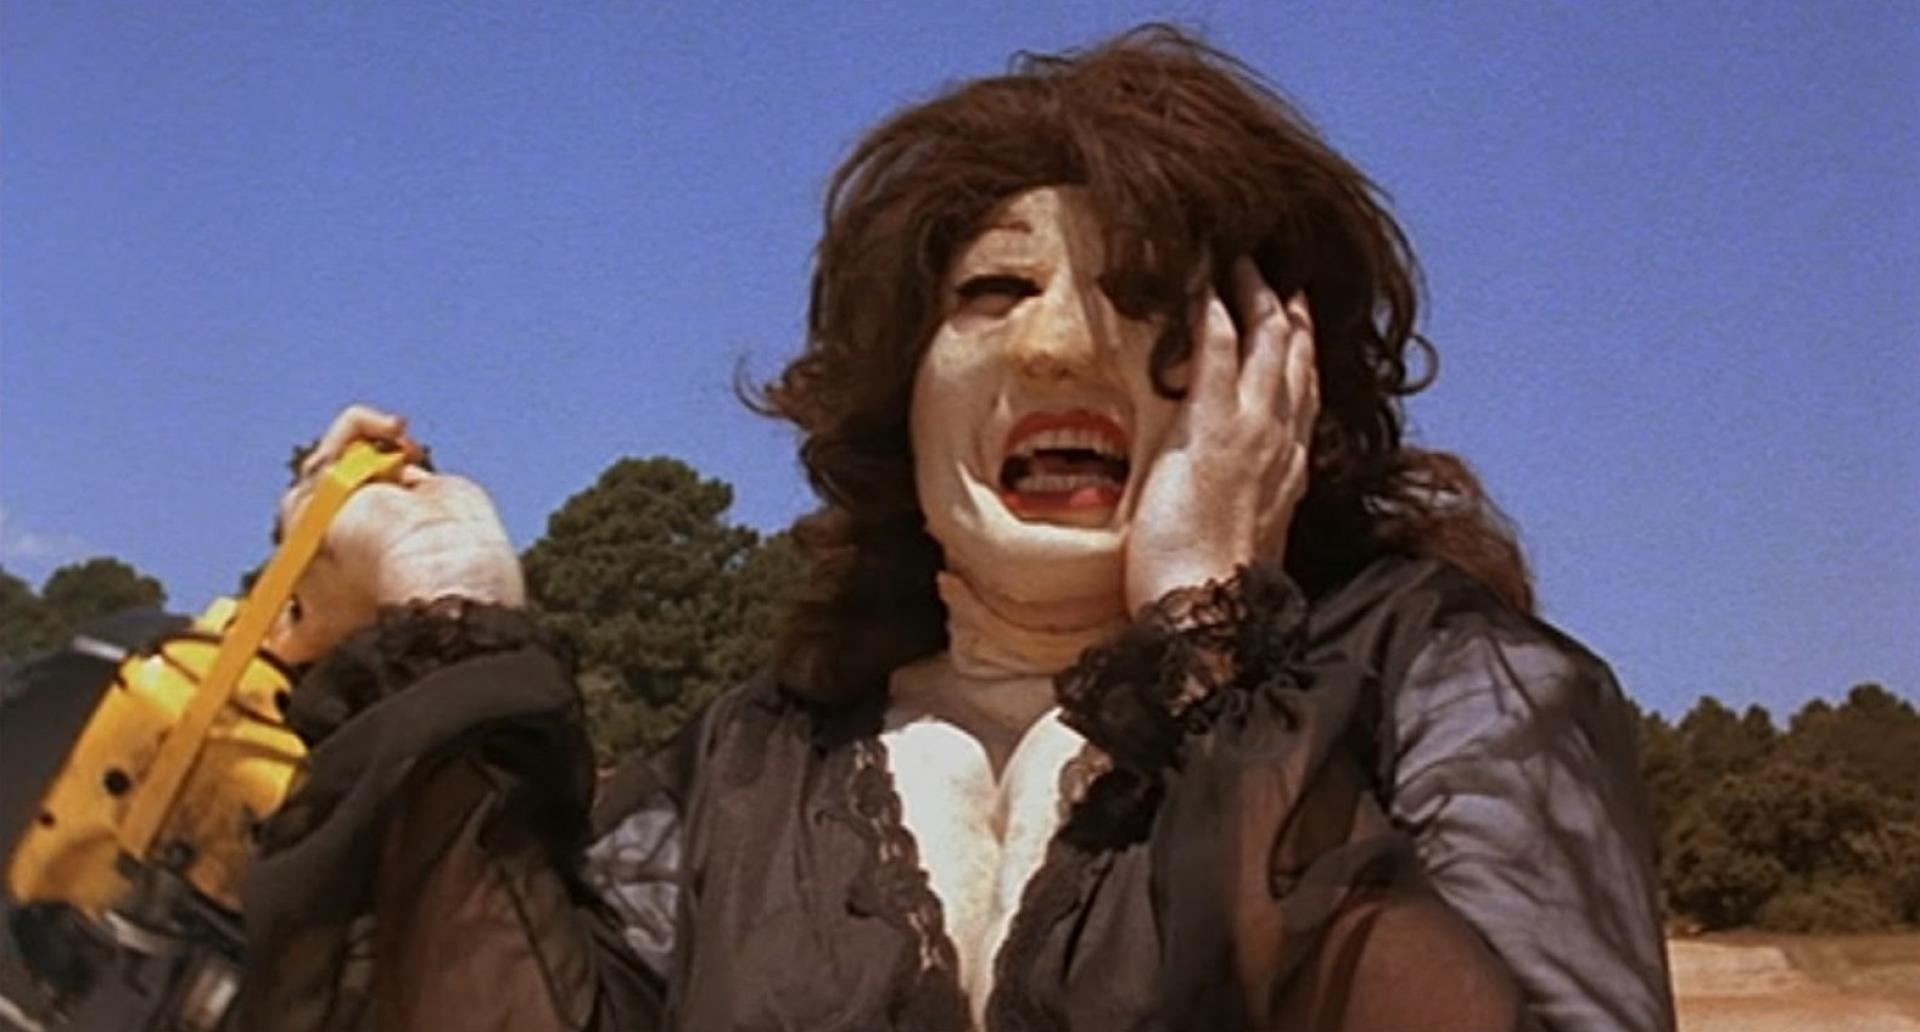 Texas Chainsaw Massace: The Next Generation (1994) 2. kép